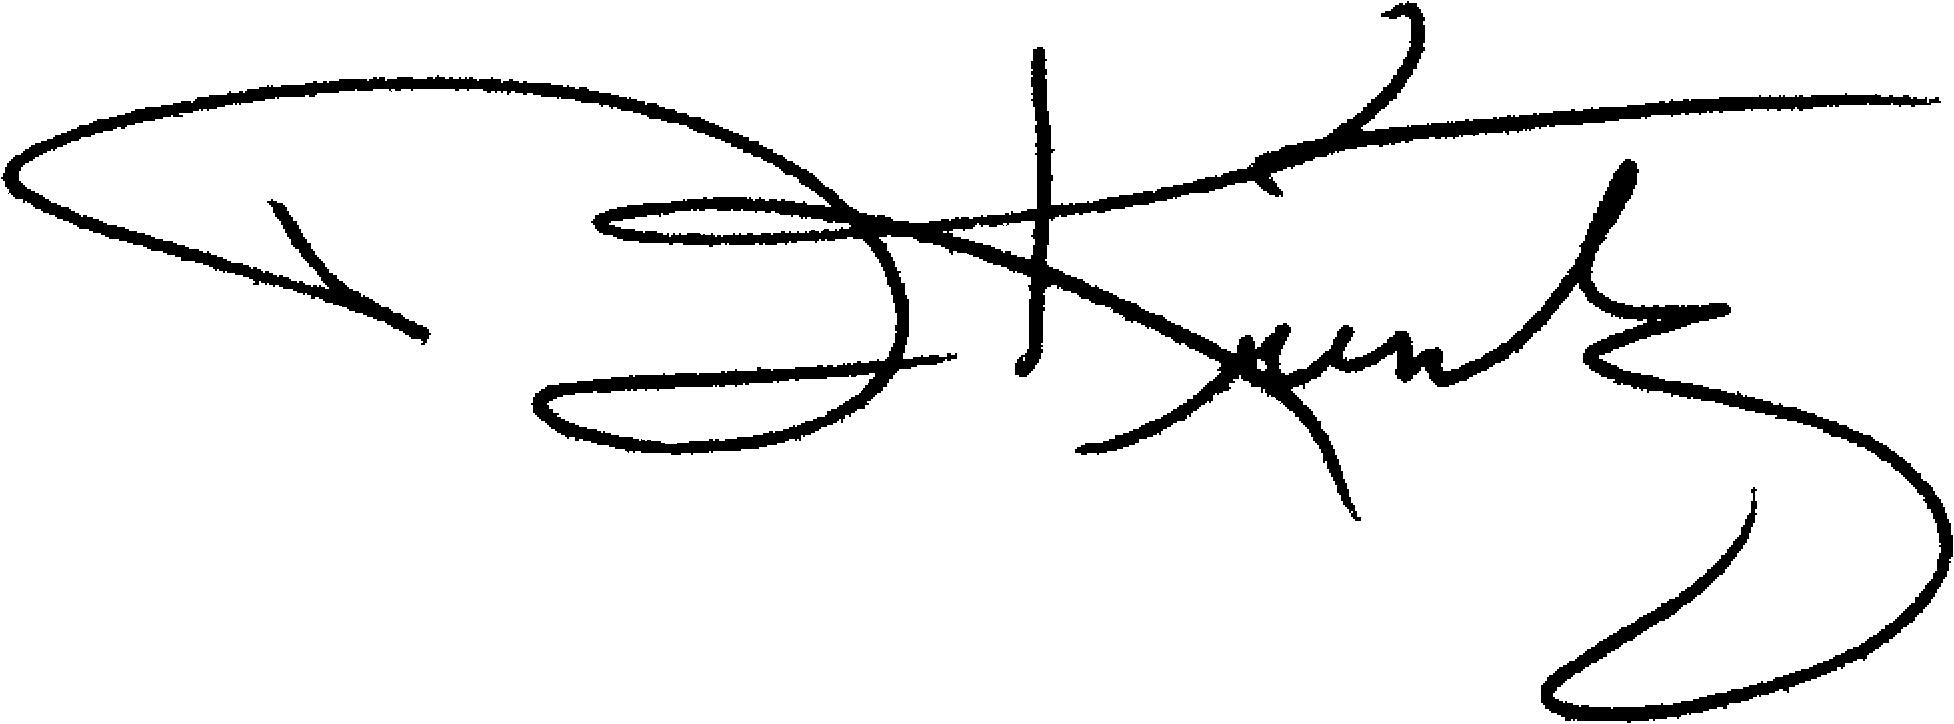 DANKUNTZSIG2A02.JPG